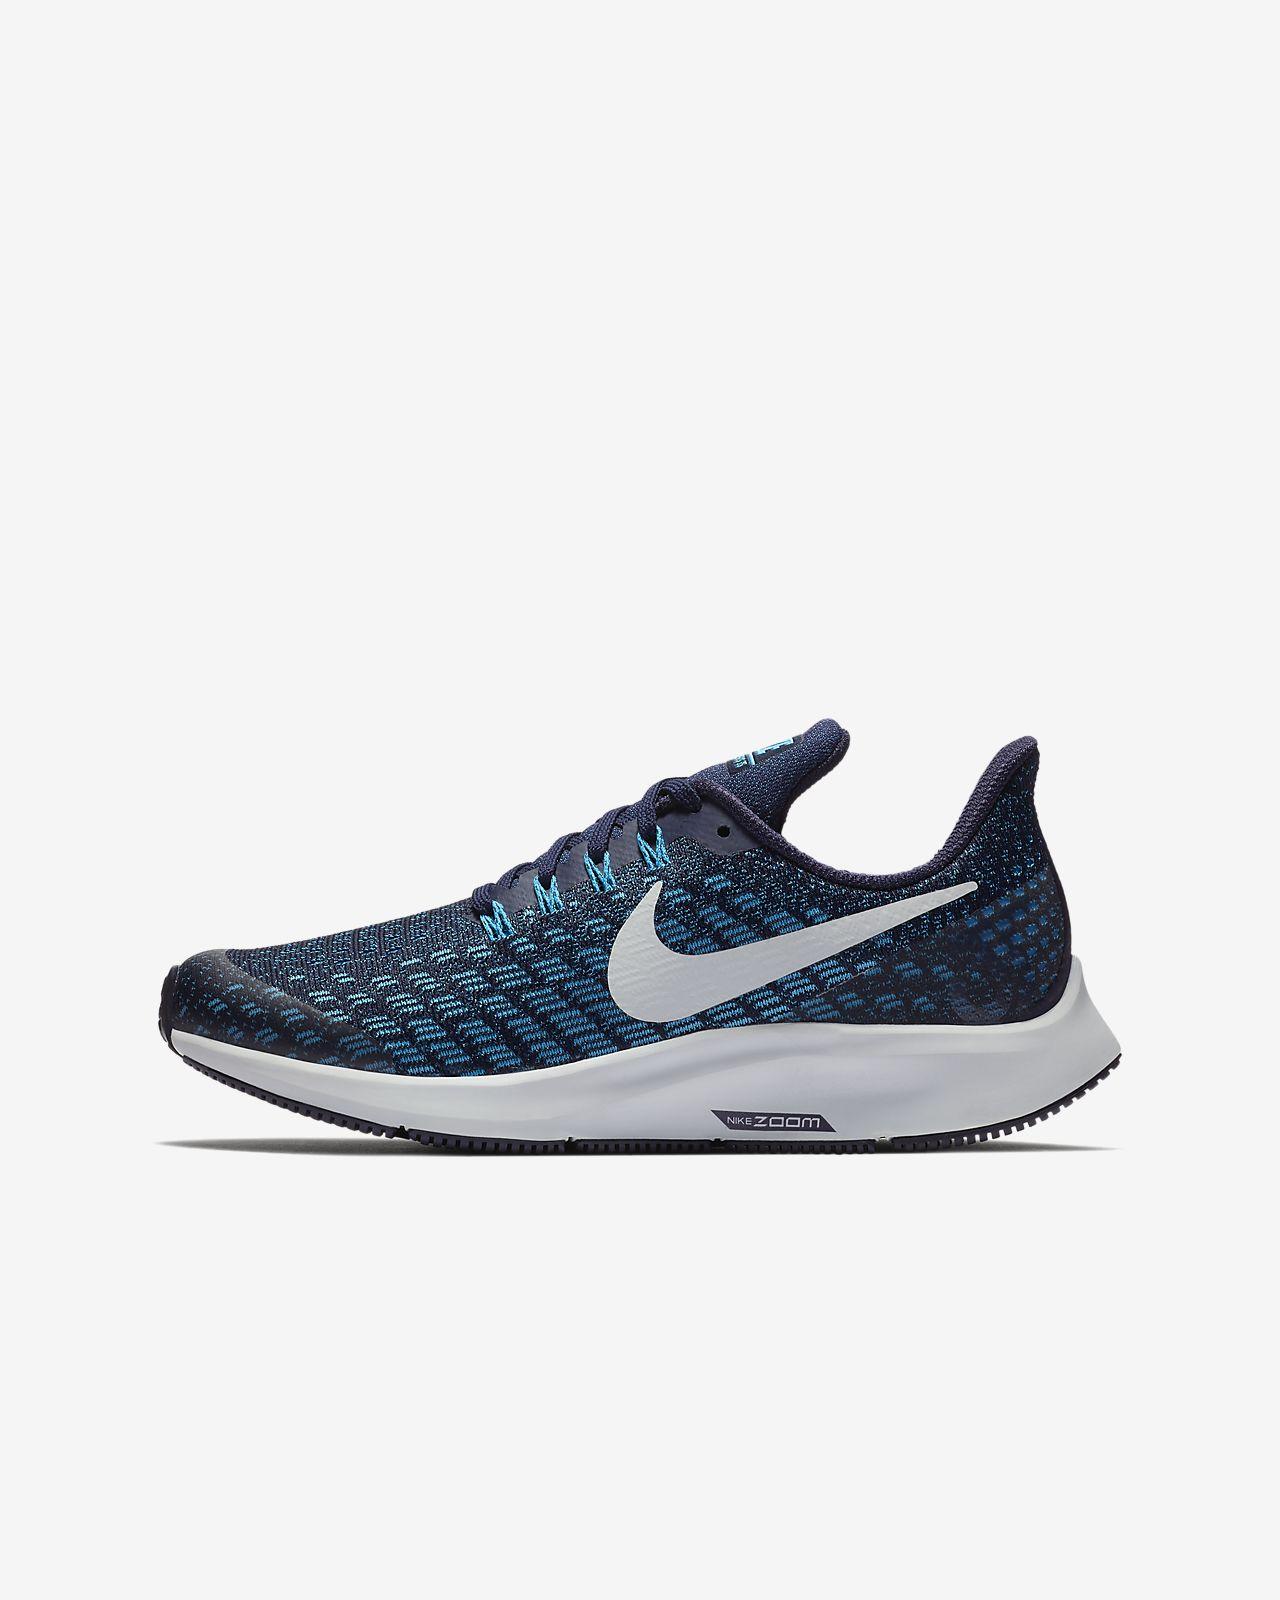 online retailer ce554 0d5e3 Nike Air Zoom Pegasus 35 Little/Big Kids' Running Shoe. Nike.com